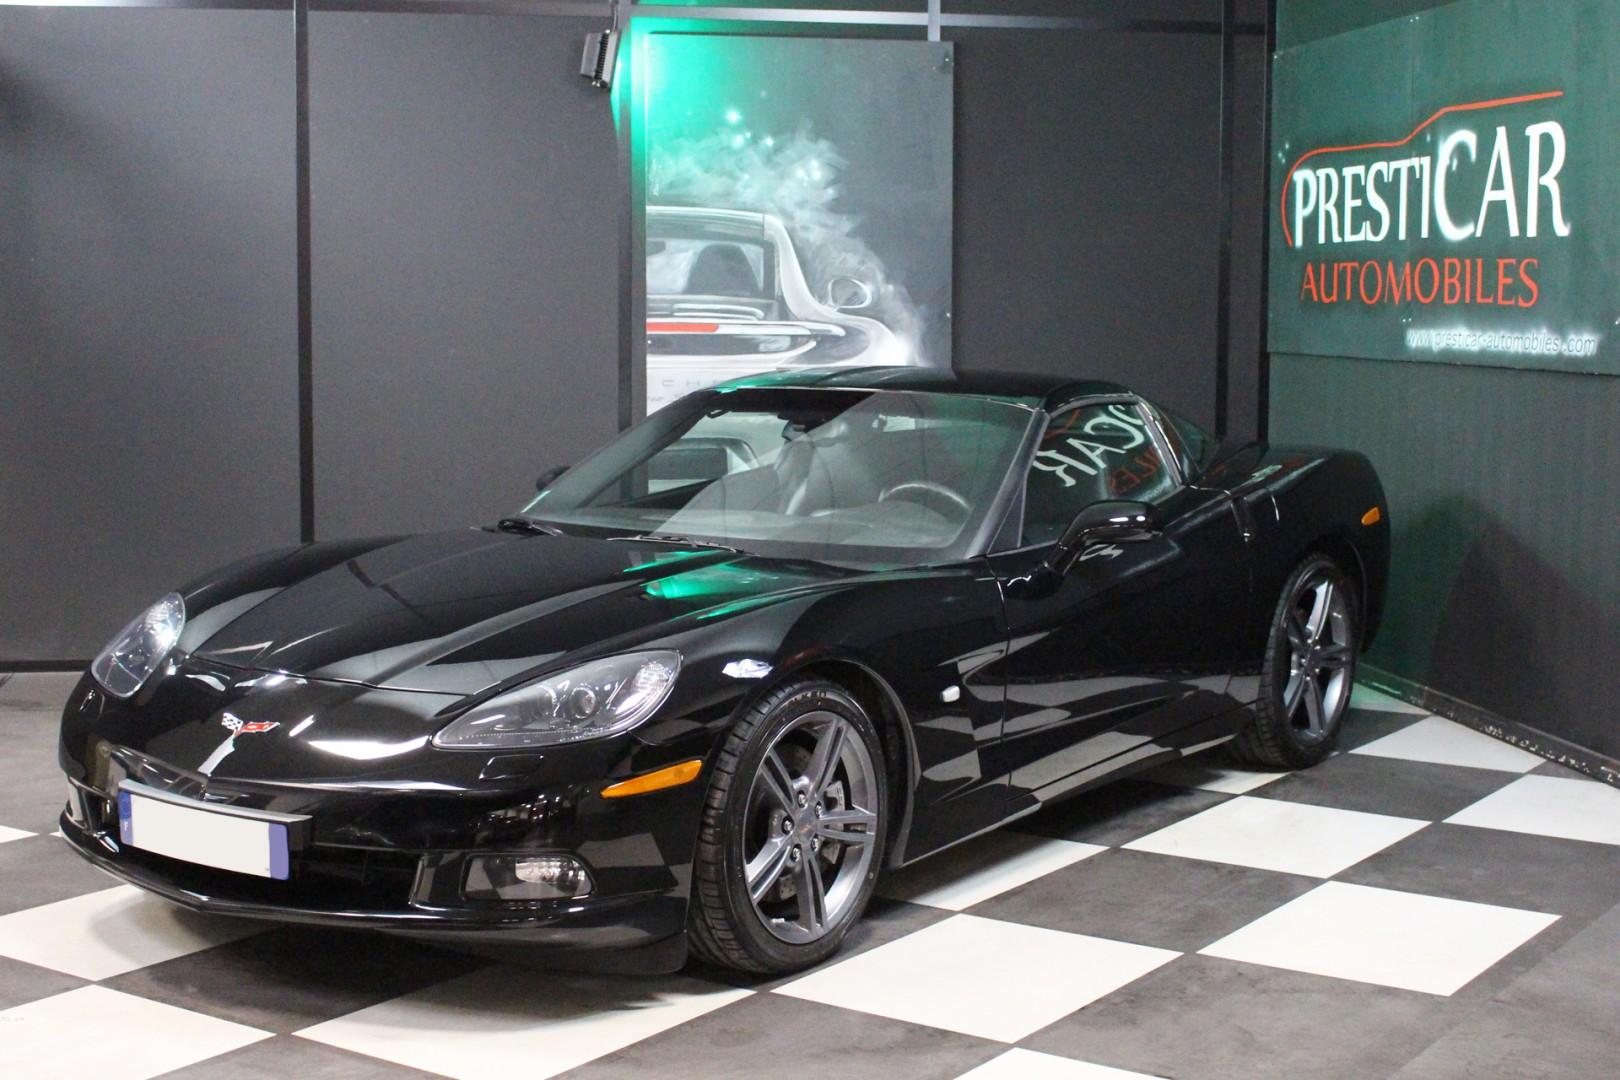 corvette c6 6 2 v8 ls3 437 ch bvm presticar automobiles. Black Bedroom Furniture Sets. Home Design Ideas